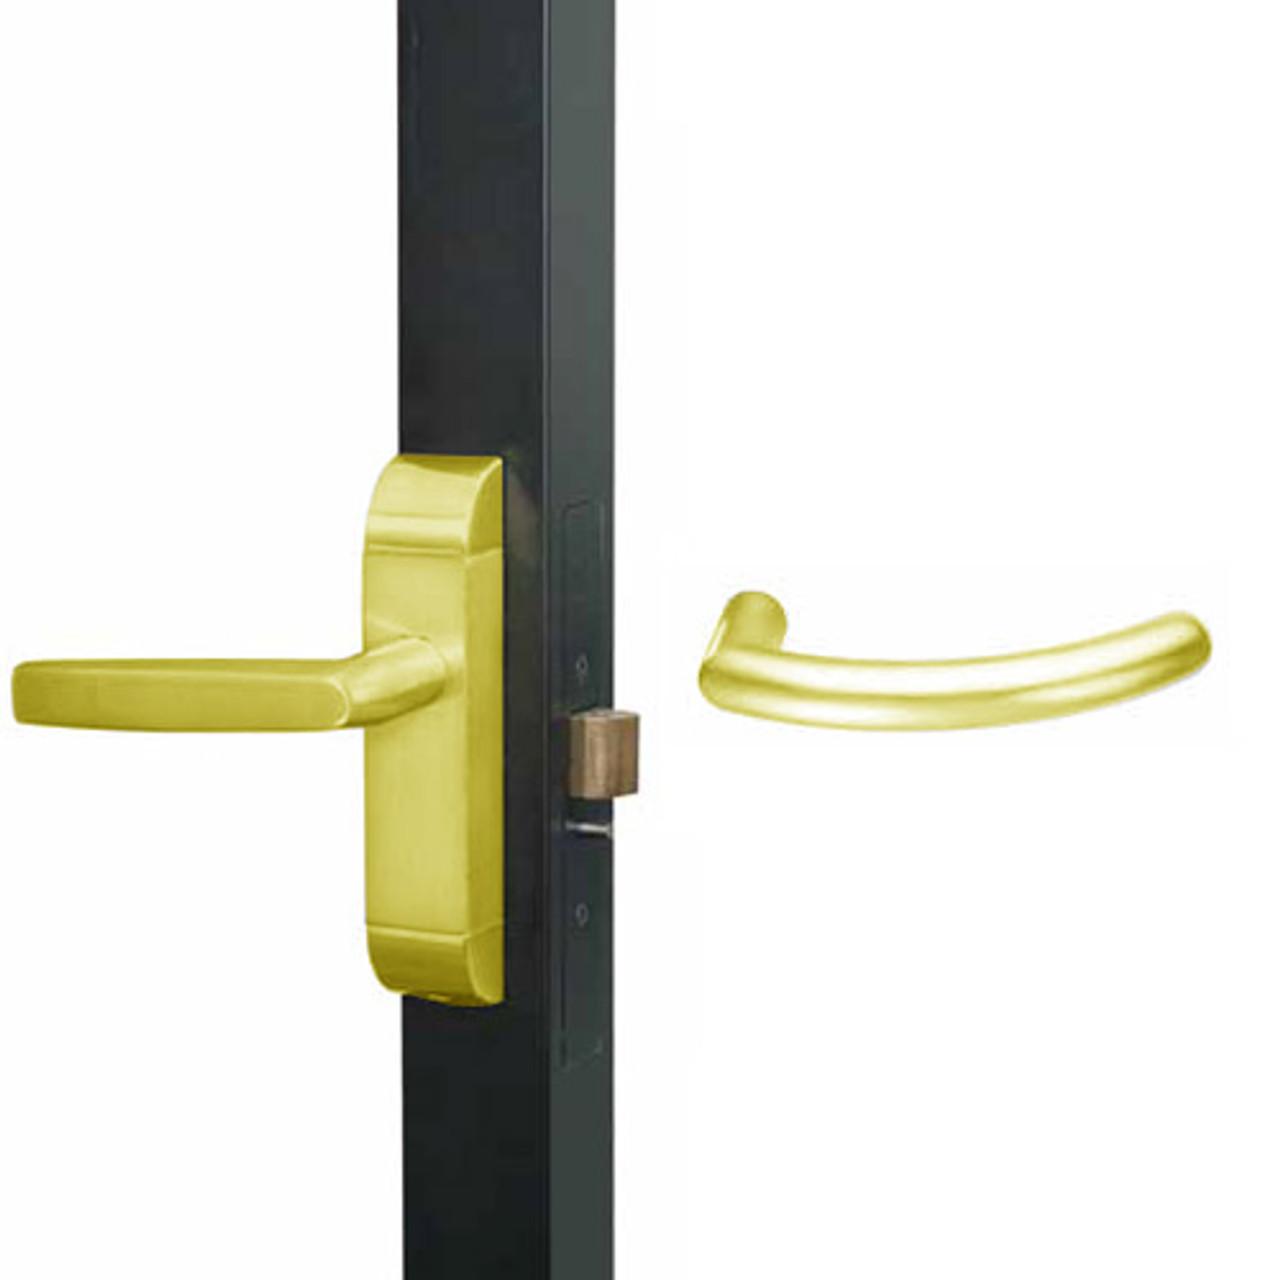 4600-MG-522-US3 Adams Rite MG Designer Deadlatch handle in Bright Brass Finish